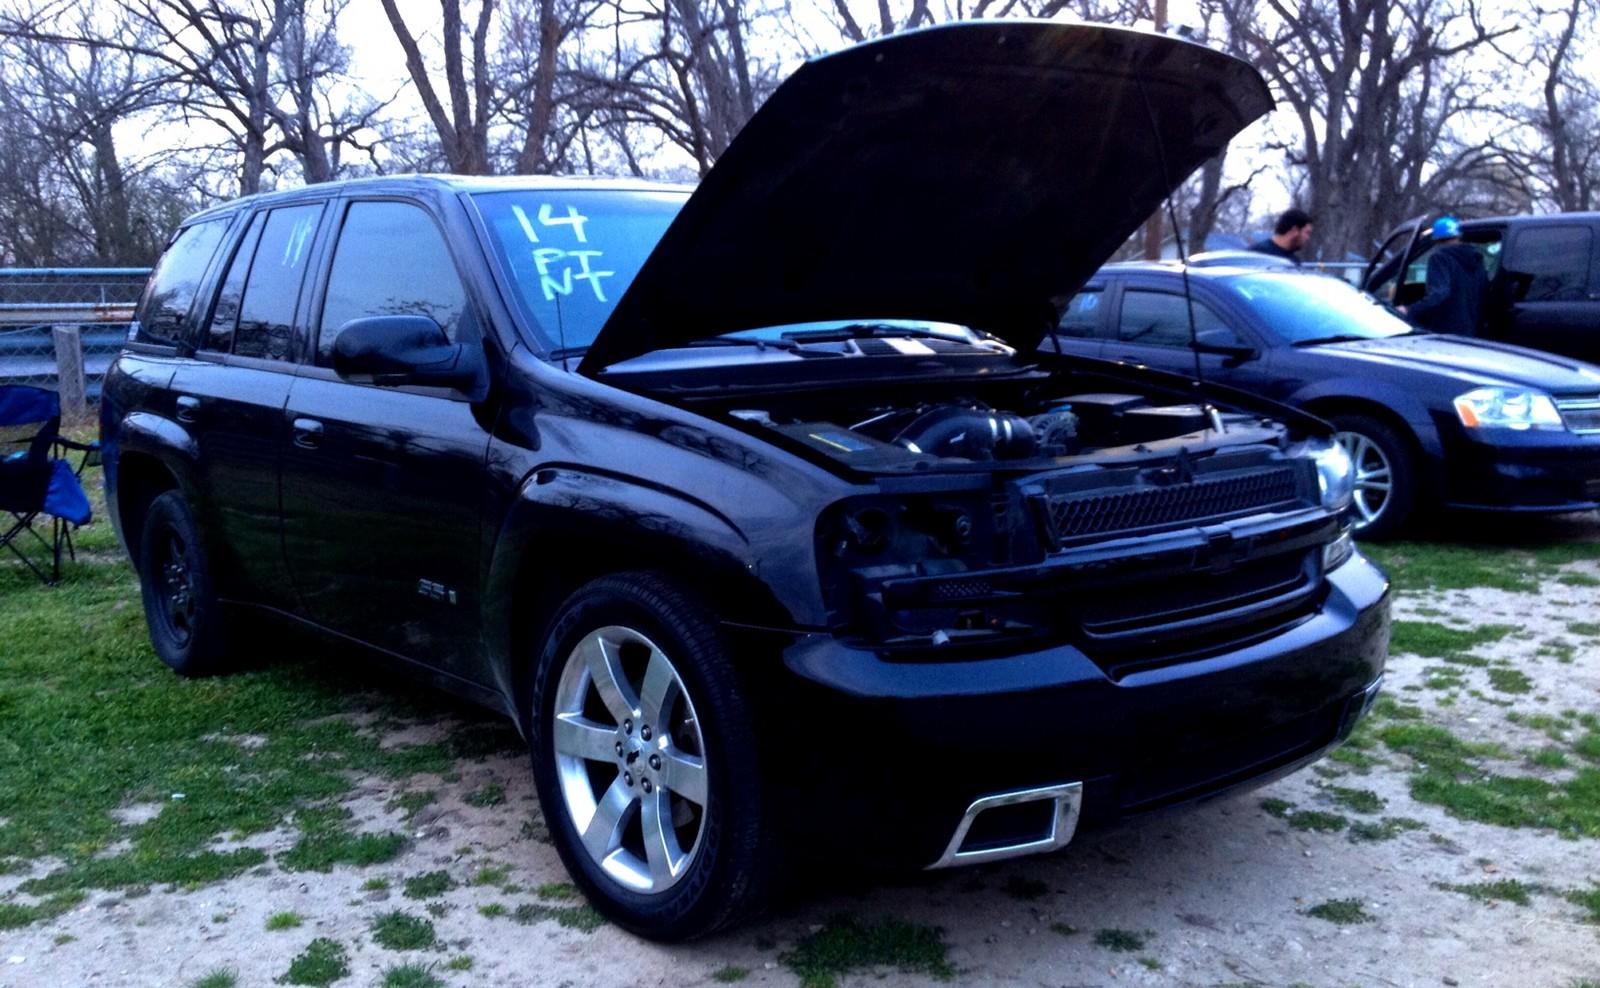 Blazer black chevy trailblazer : 2008 Black Chevrolet TrailBlazer SS Pictures, Mods, Upgrades ...